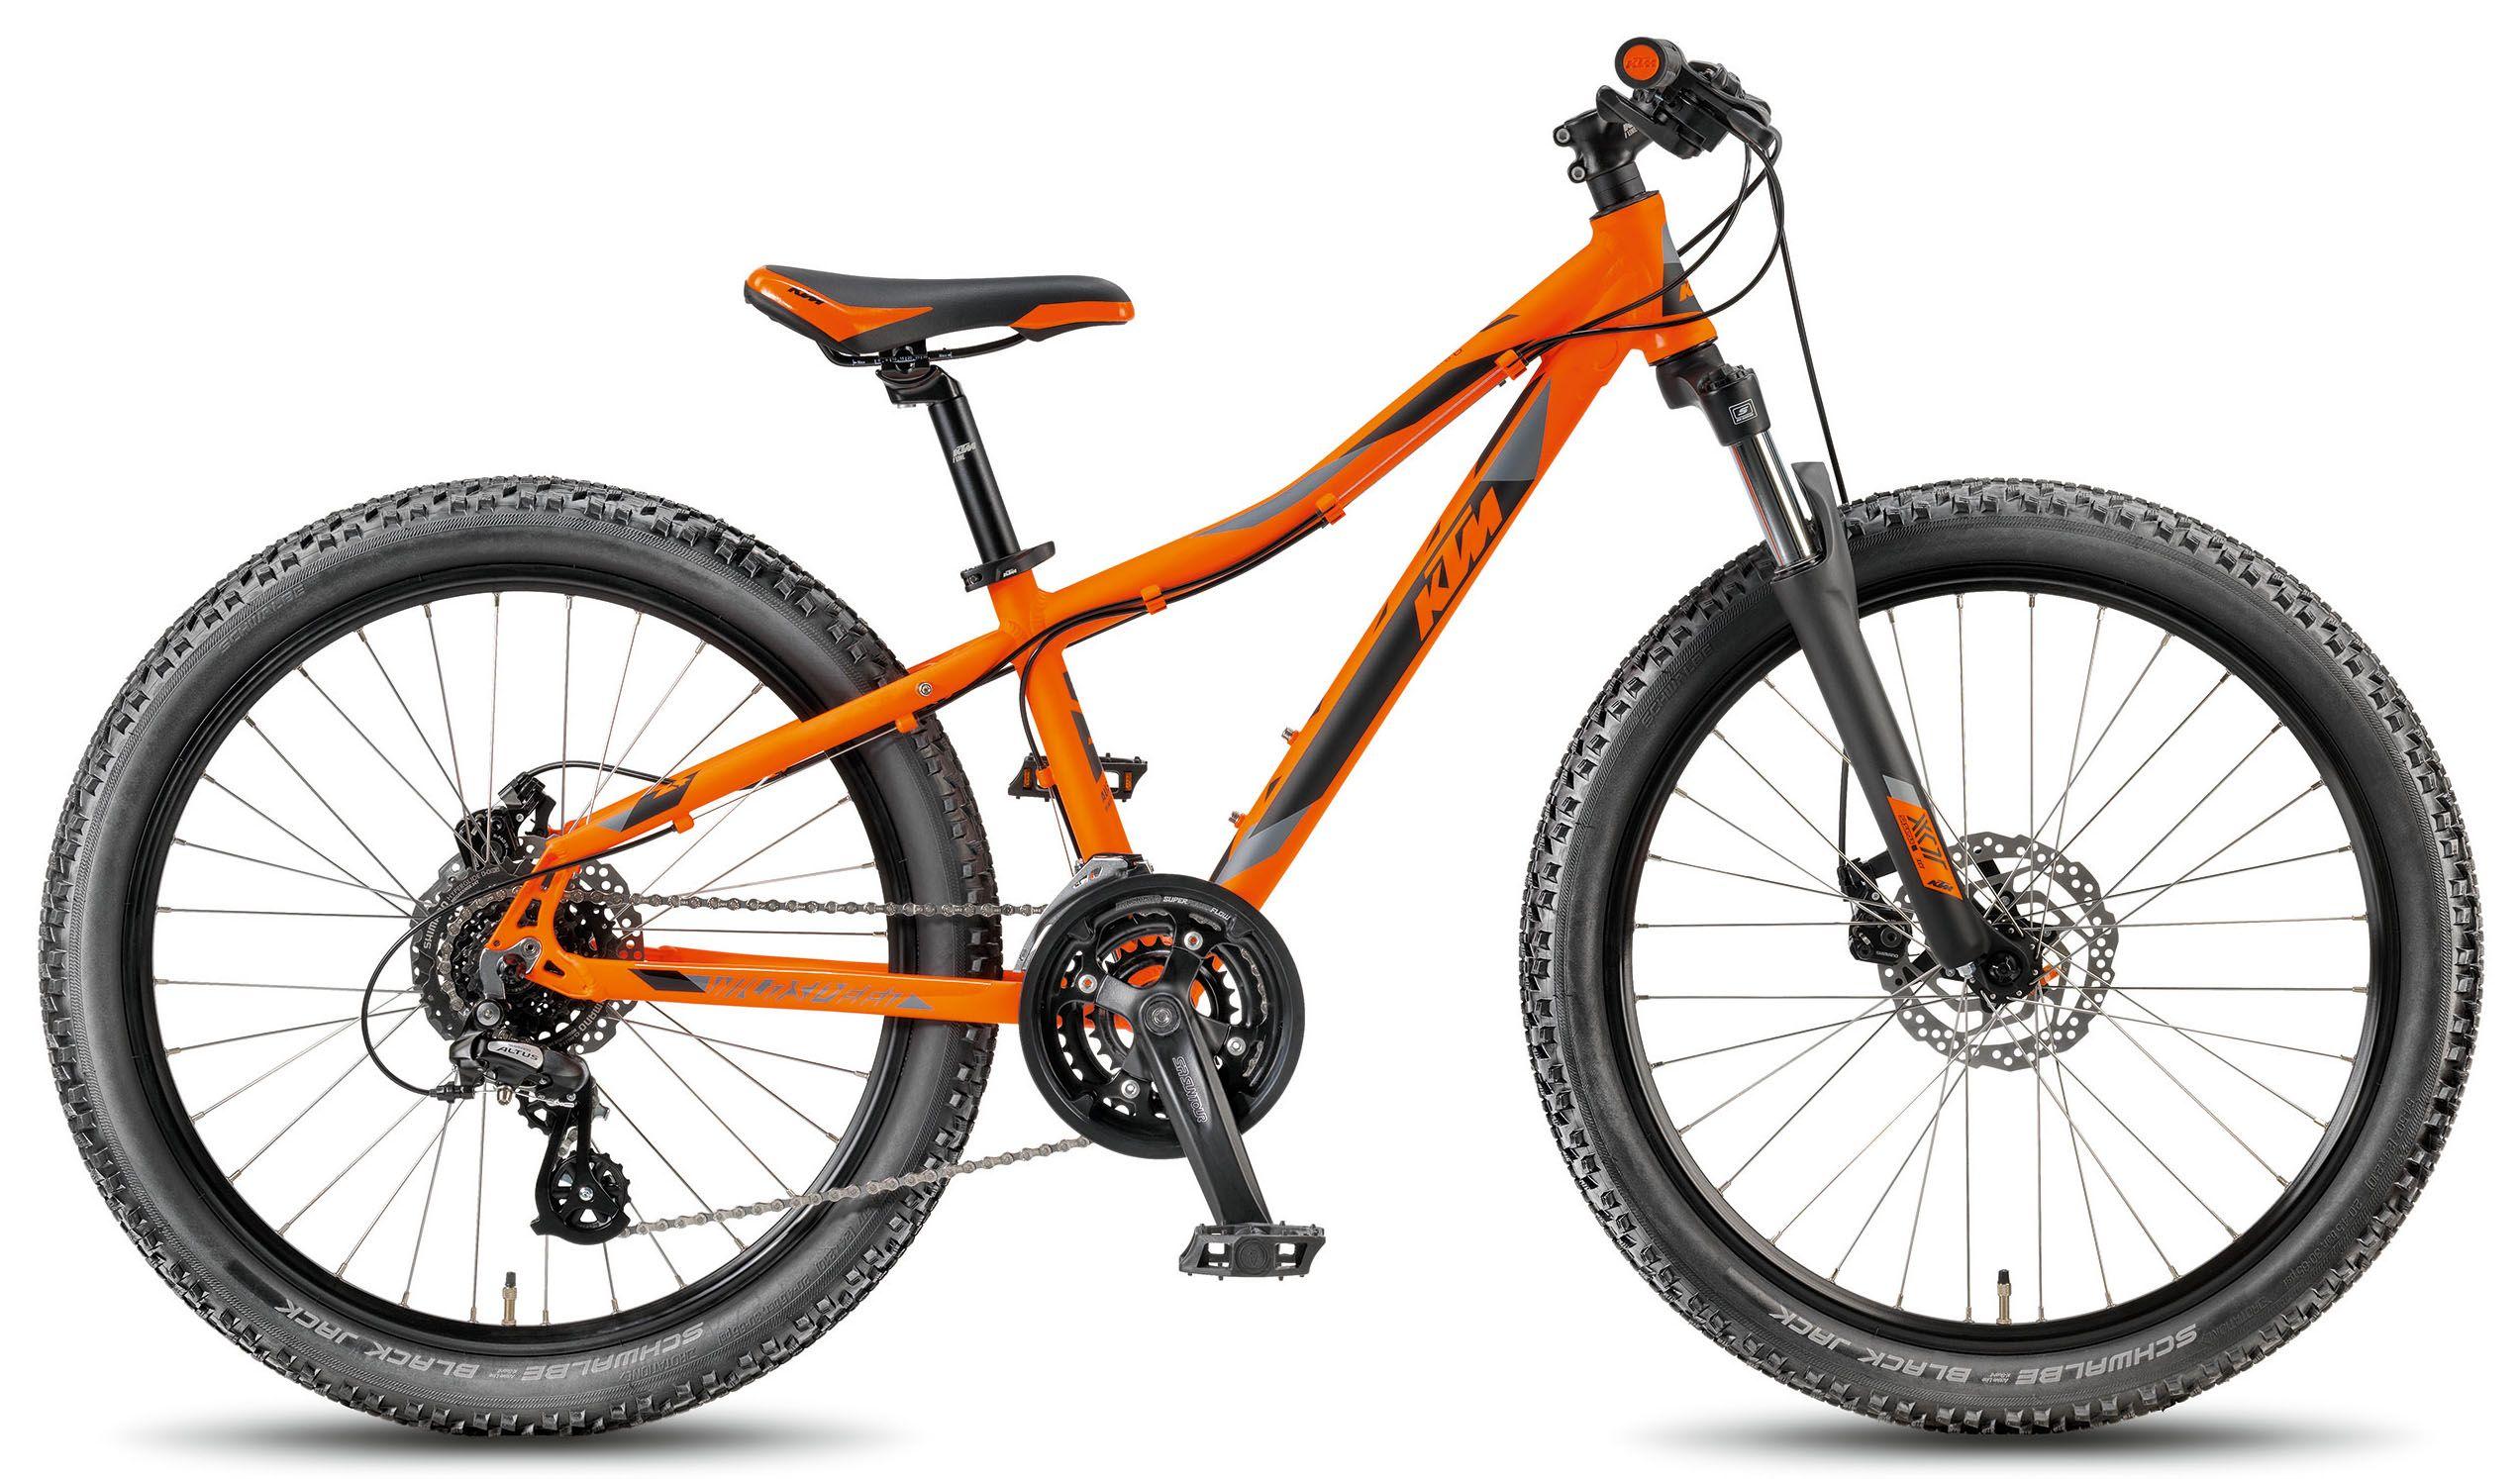 Велосипед KTM Wild Speed 24.24 Disc 2018 горный велосипед lamborghini one wheel folding mountain bicycle bike double shock absorber oil shimano disc bb5 disc brakes   shimano